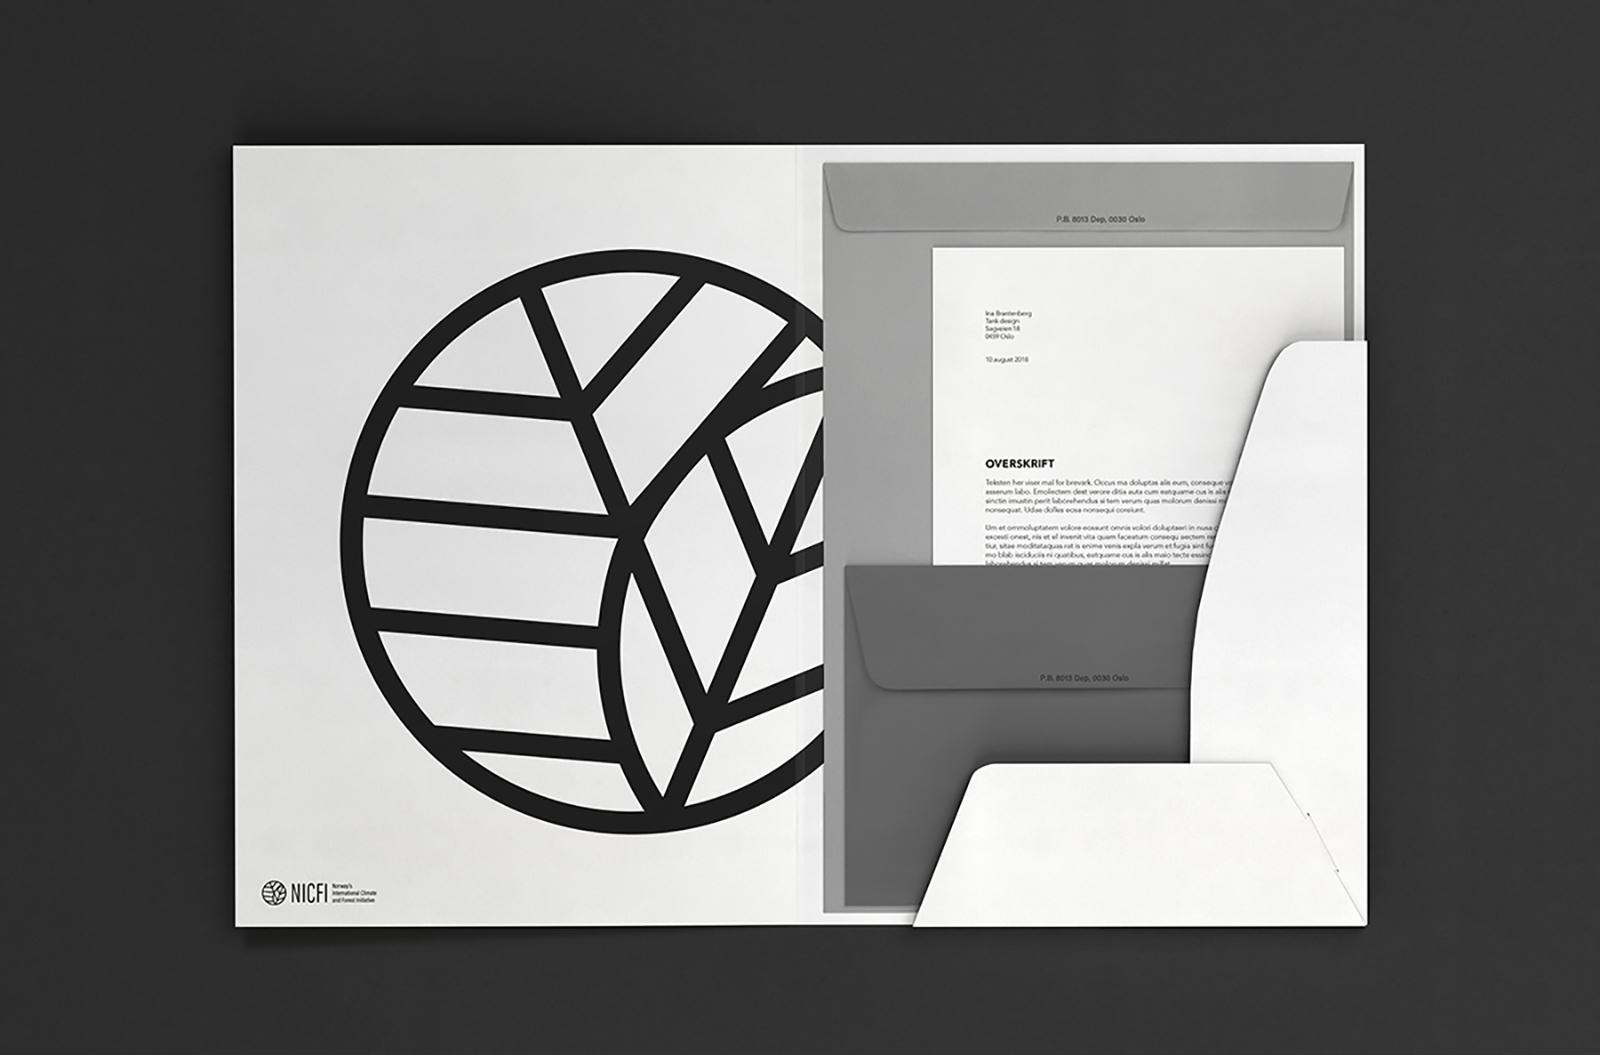 NICFI品牌视觉VI形象设计欣赏-深圳VI设计7